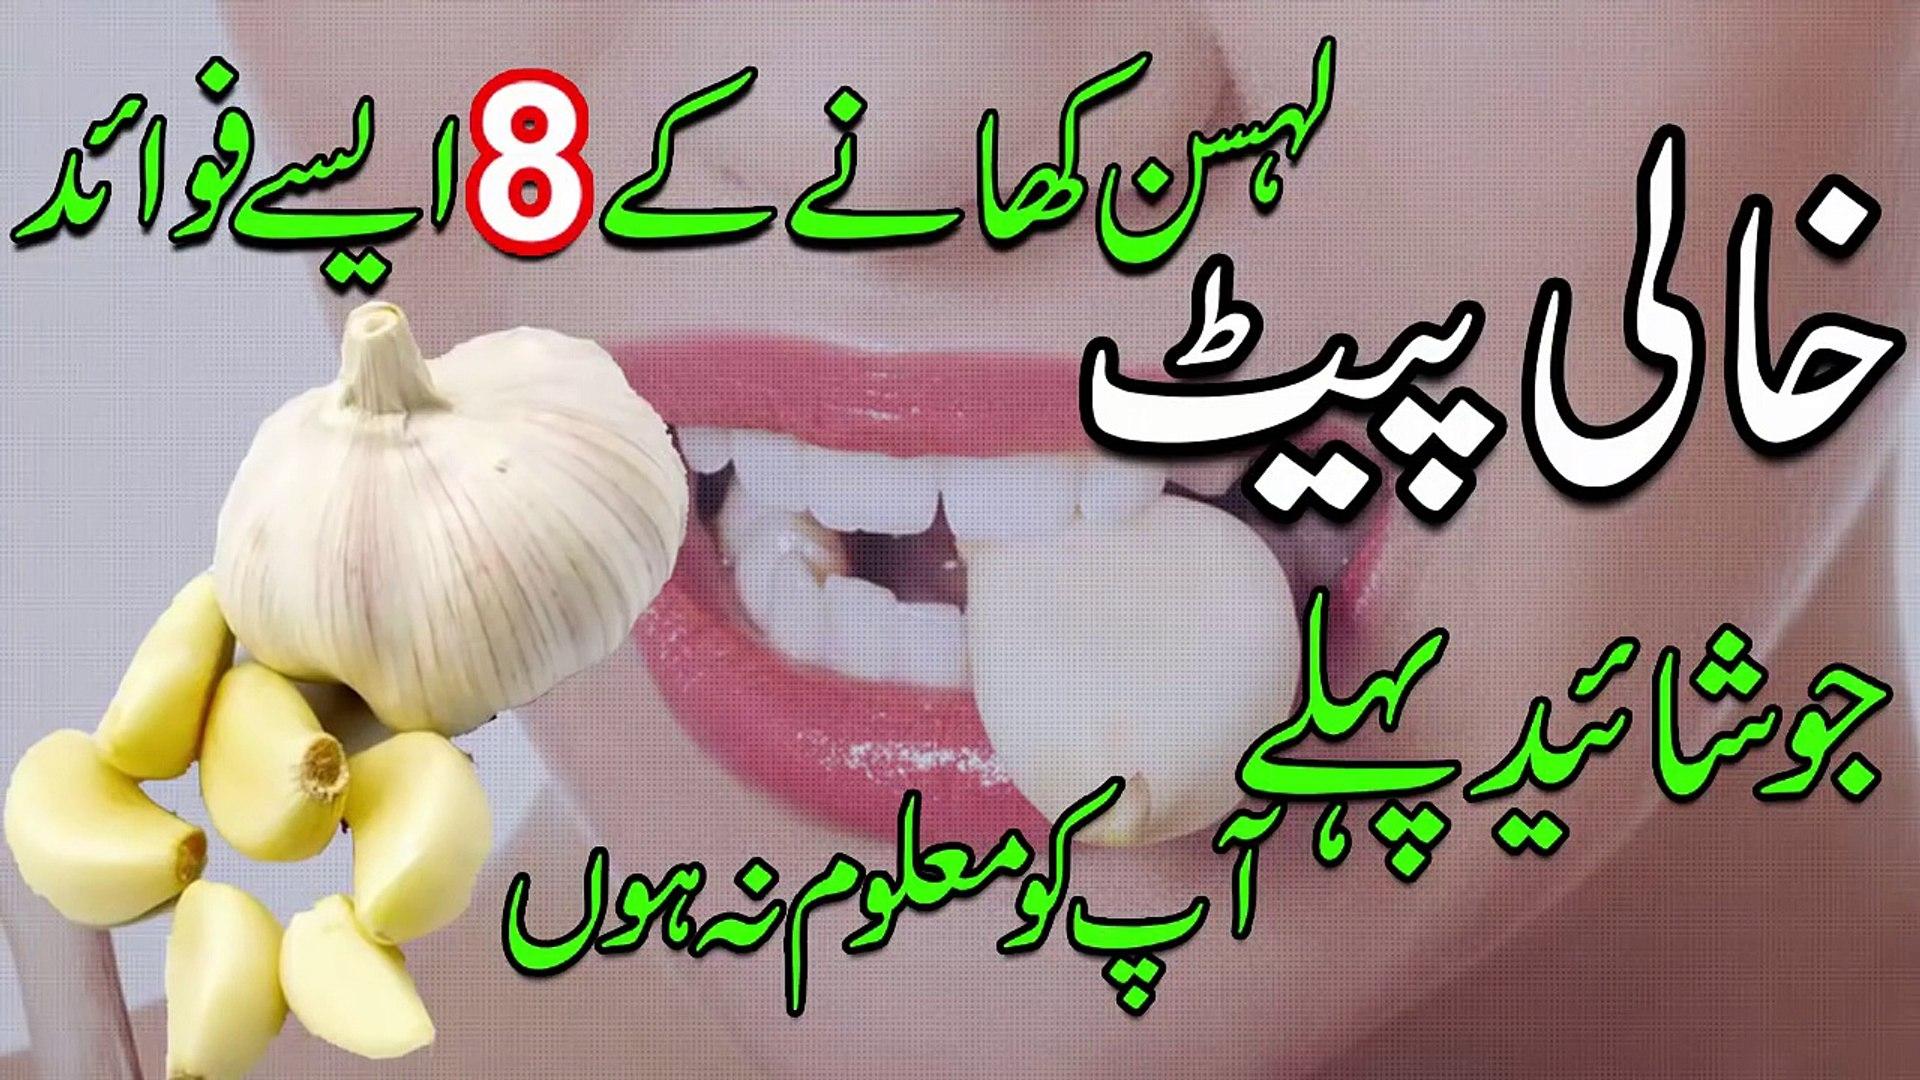 Nihaar Mu Lehsan Khaney Ke Fawaid Health Benefits of Garlic in Urdu Hindi